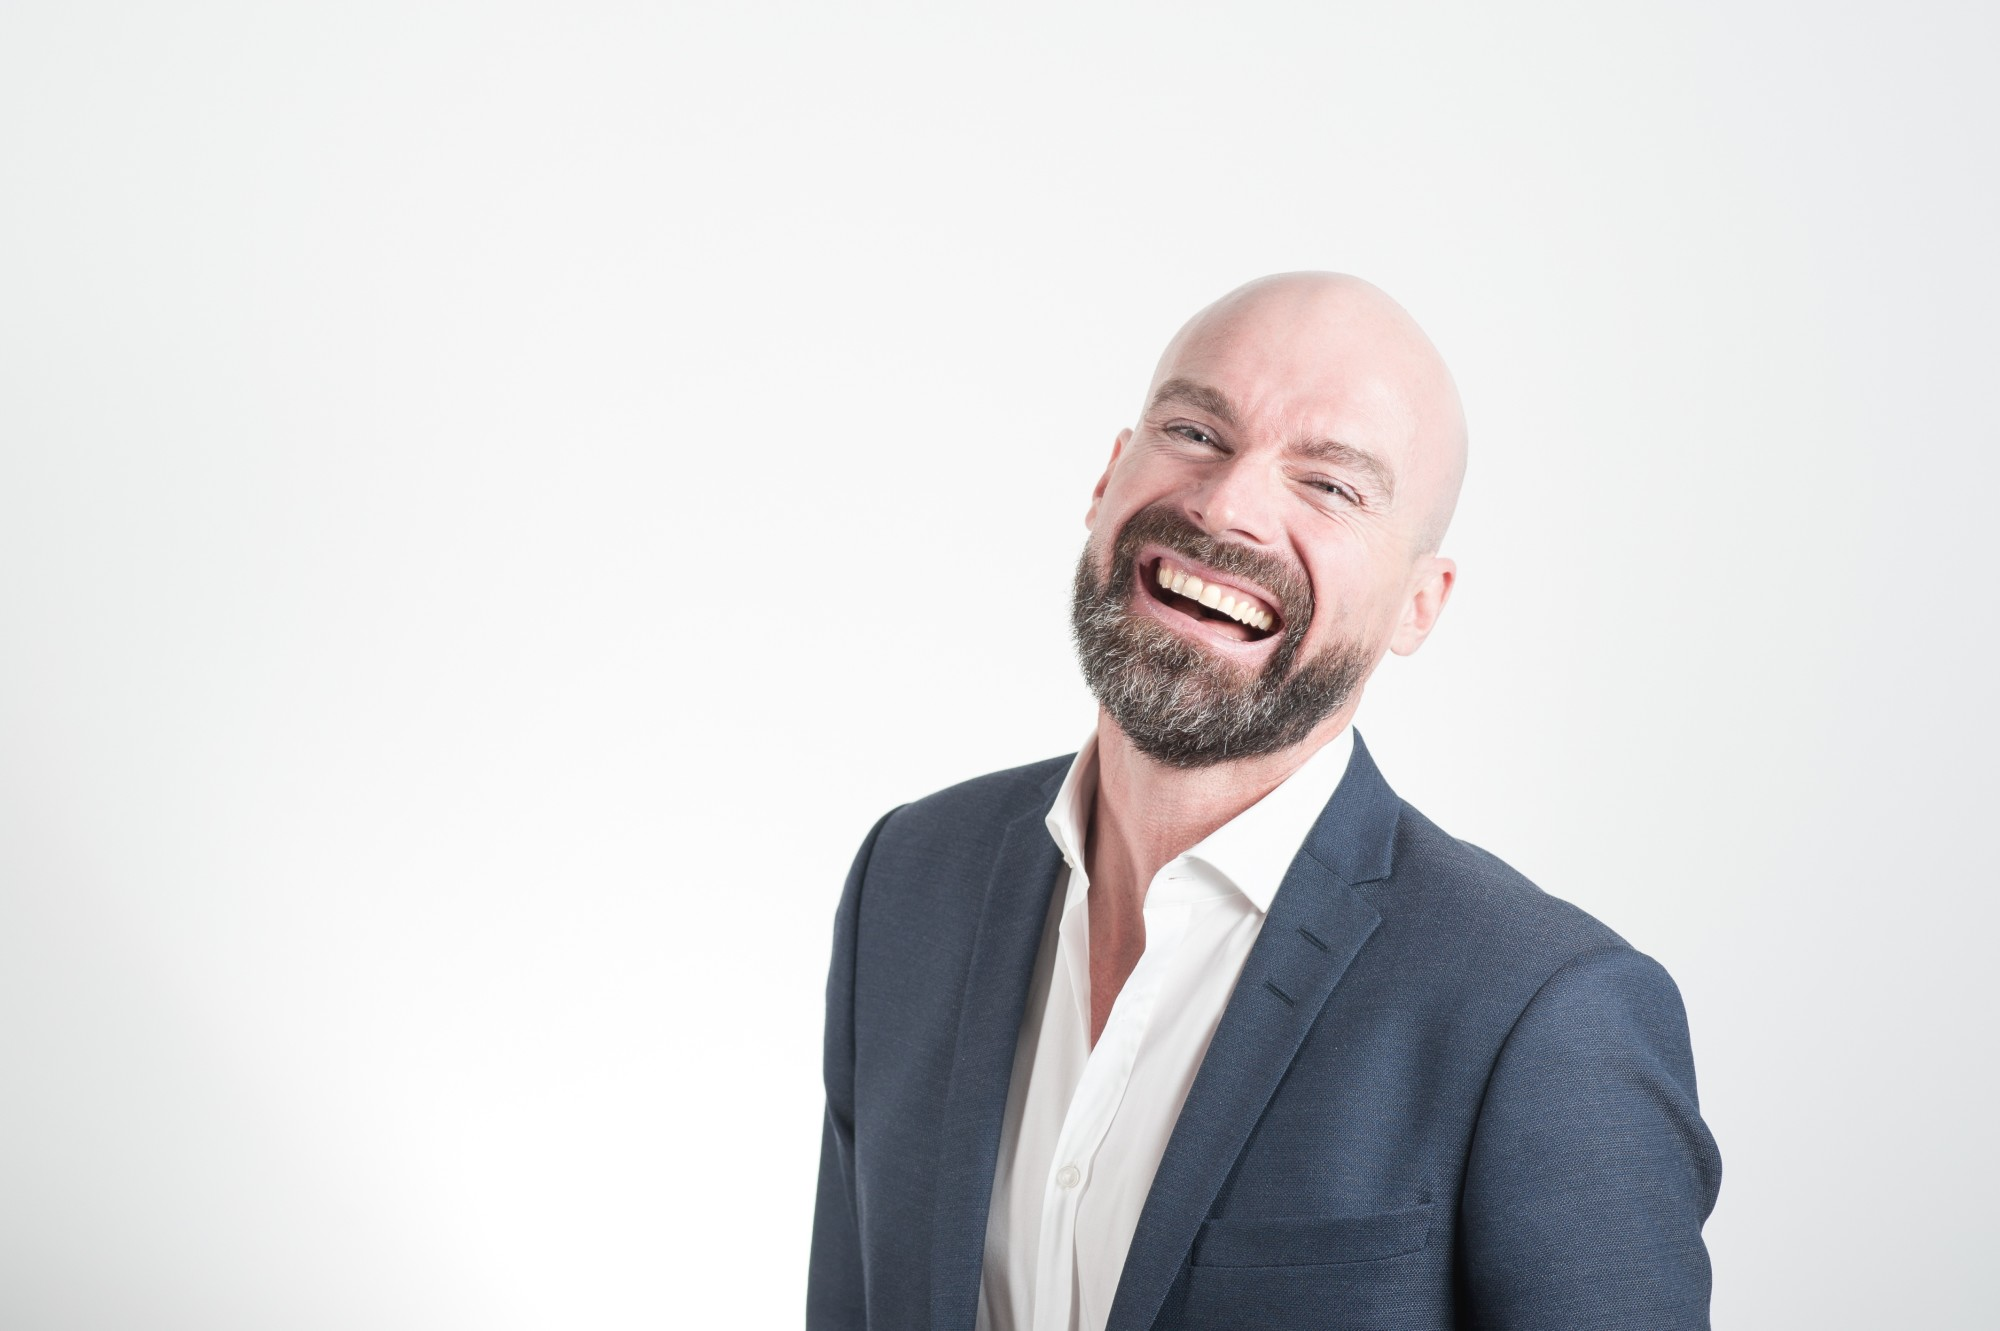 6 Surprising Benefits of Going Bald